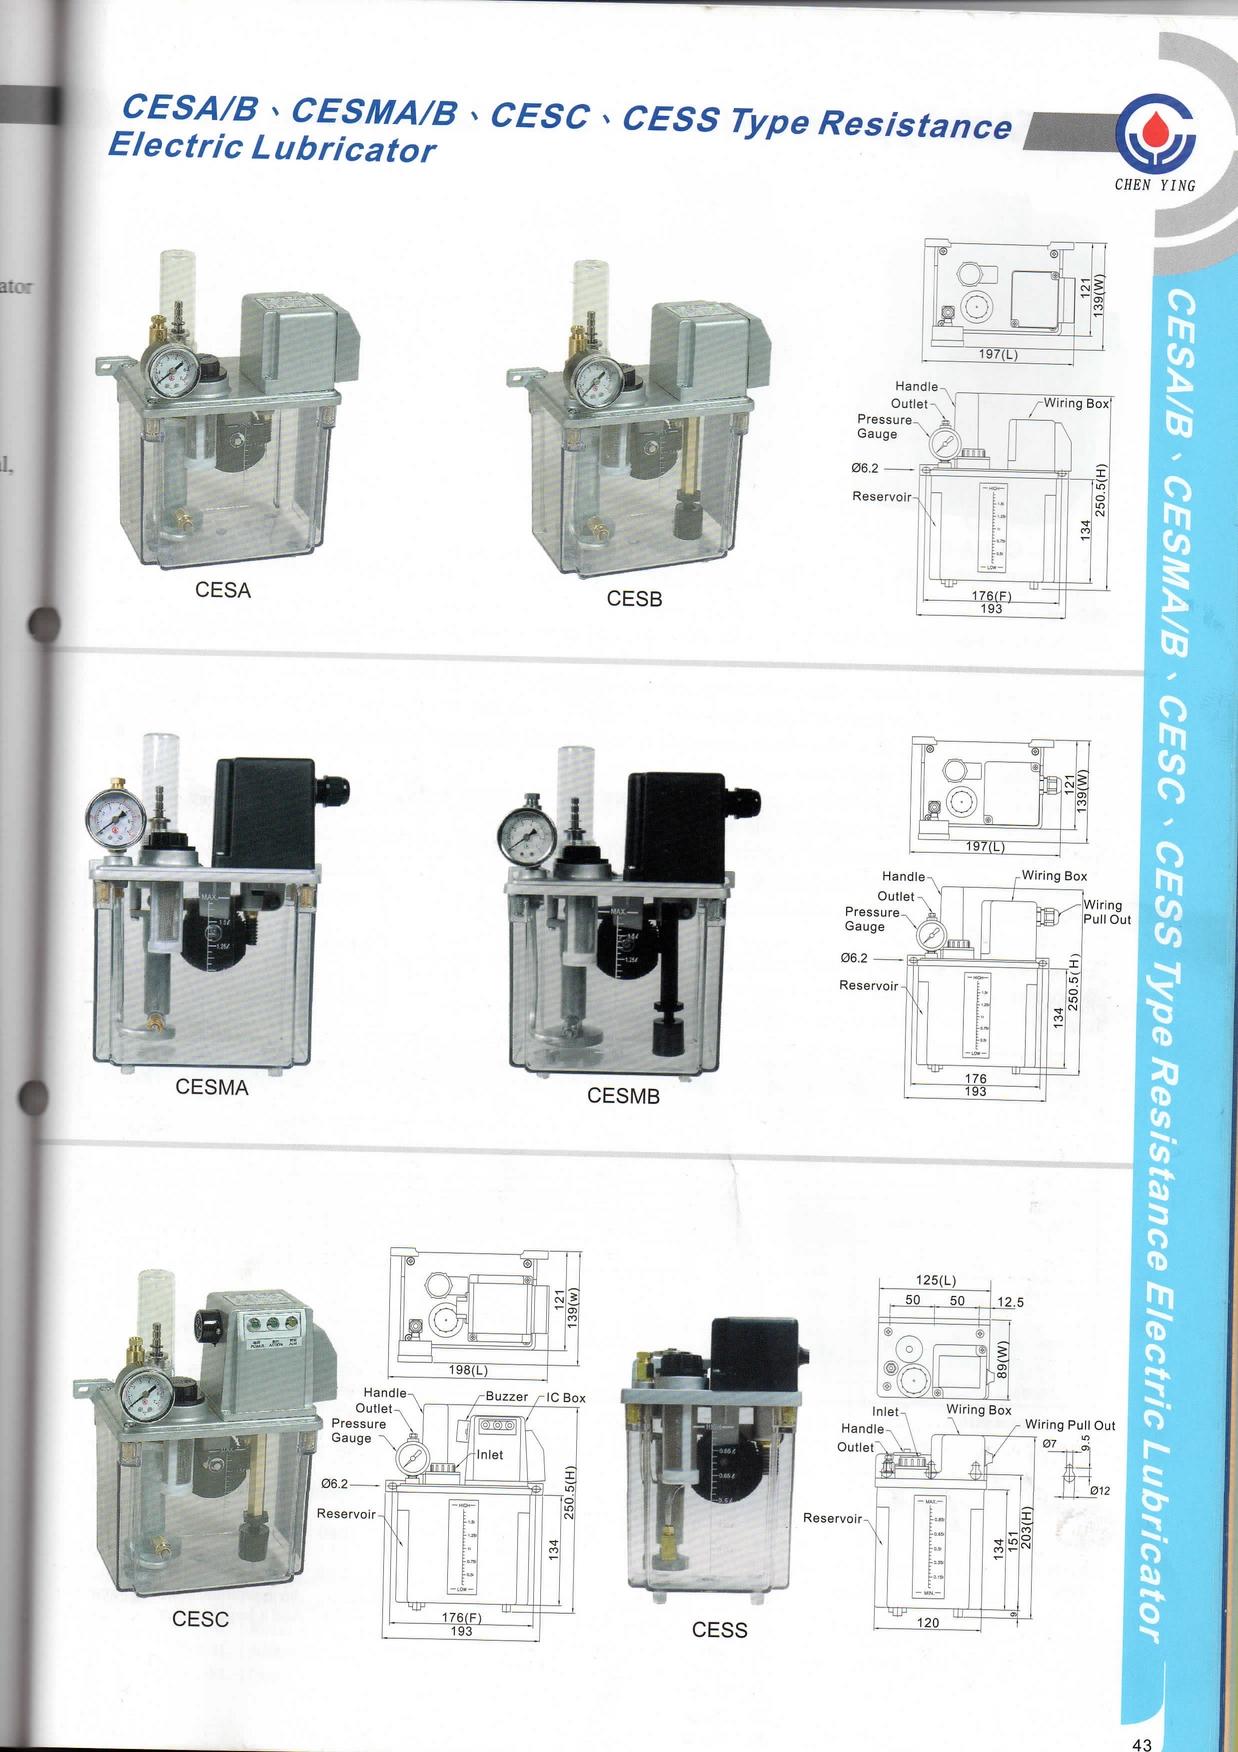 CESMA10C 220V Type Resistance Electric Lubricator Bijur 2L